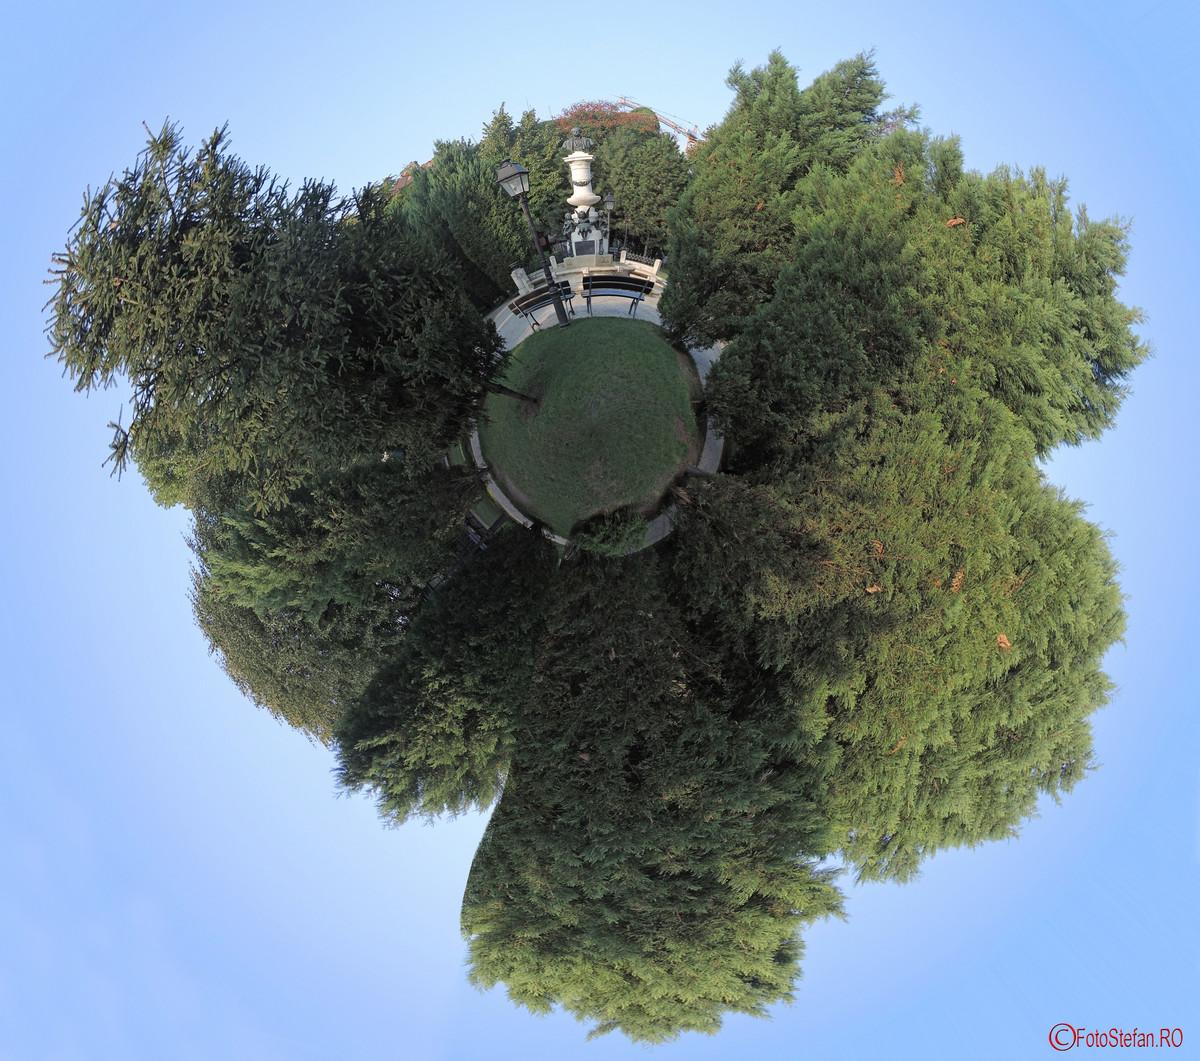 poza little planet Luigi Cazzavillan bucuresti